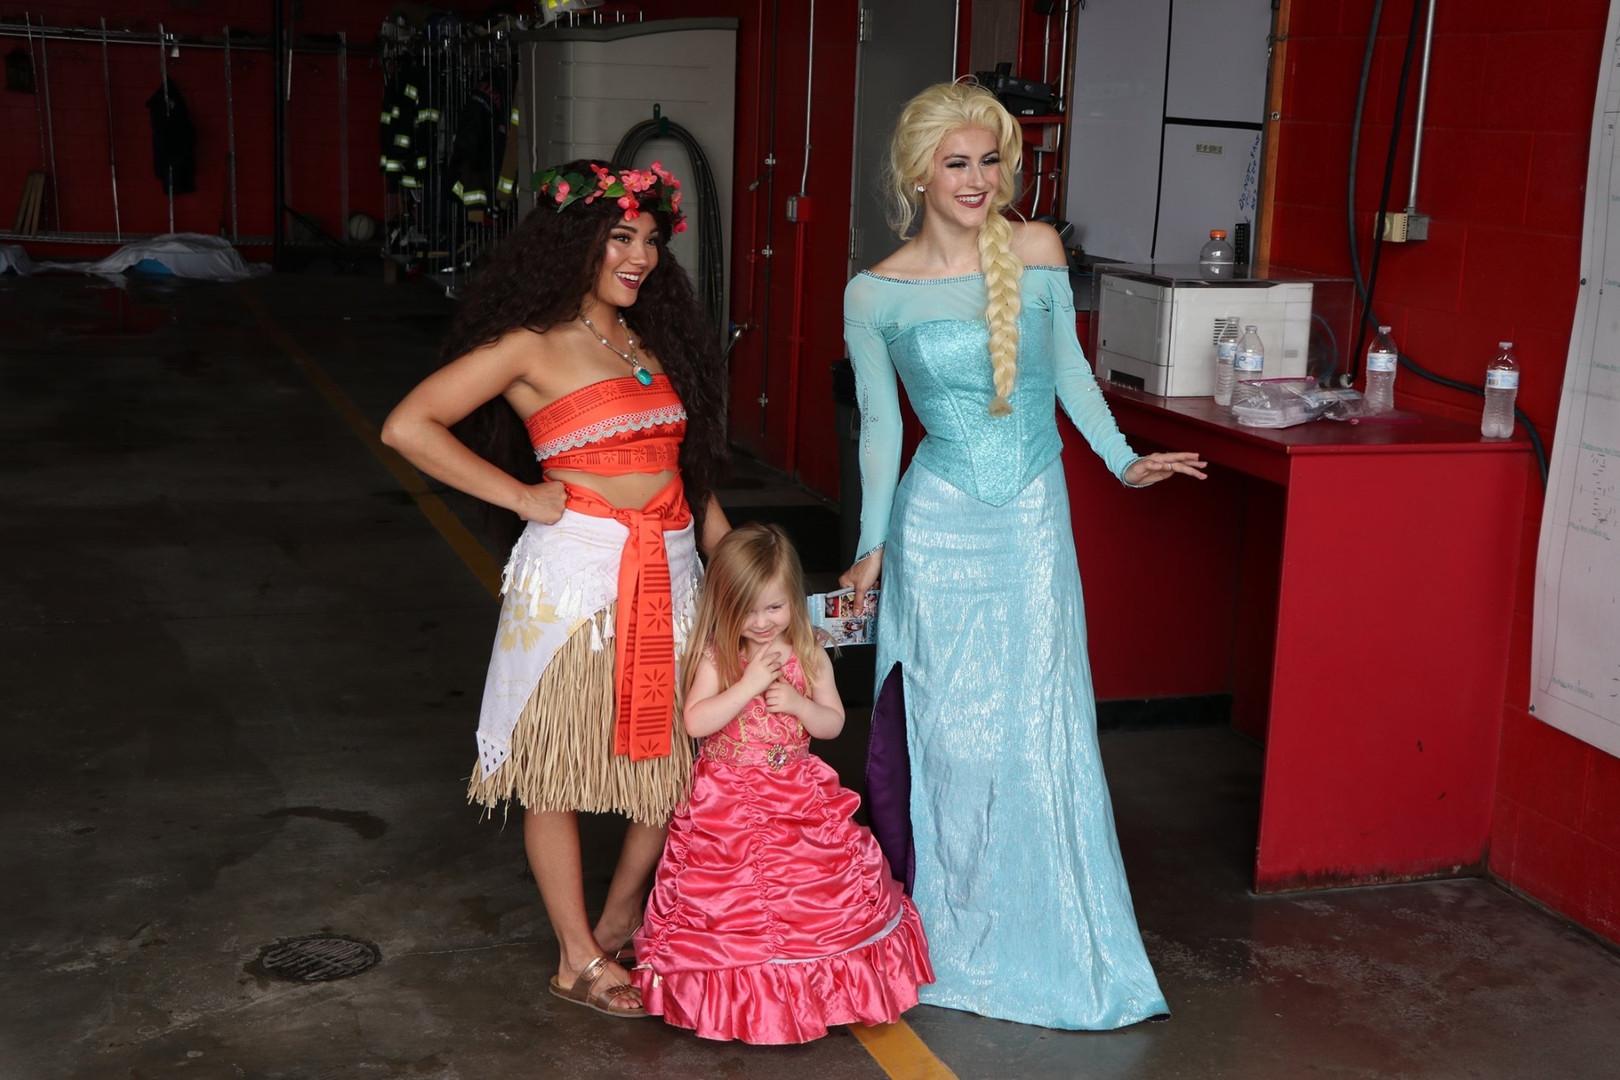 Wayfinding princess and Snow Queen at Papillion Days 2018